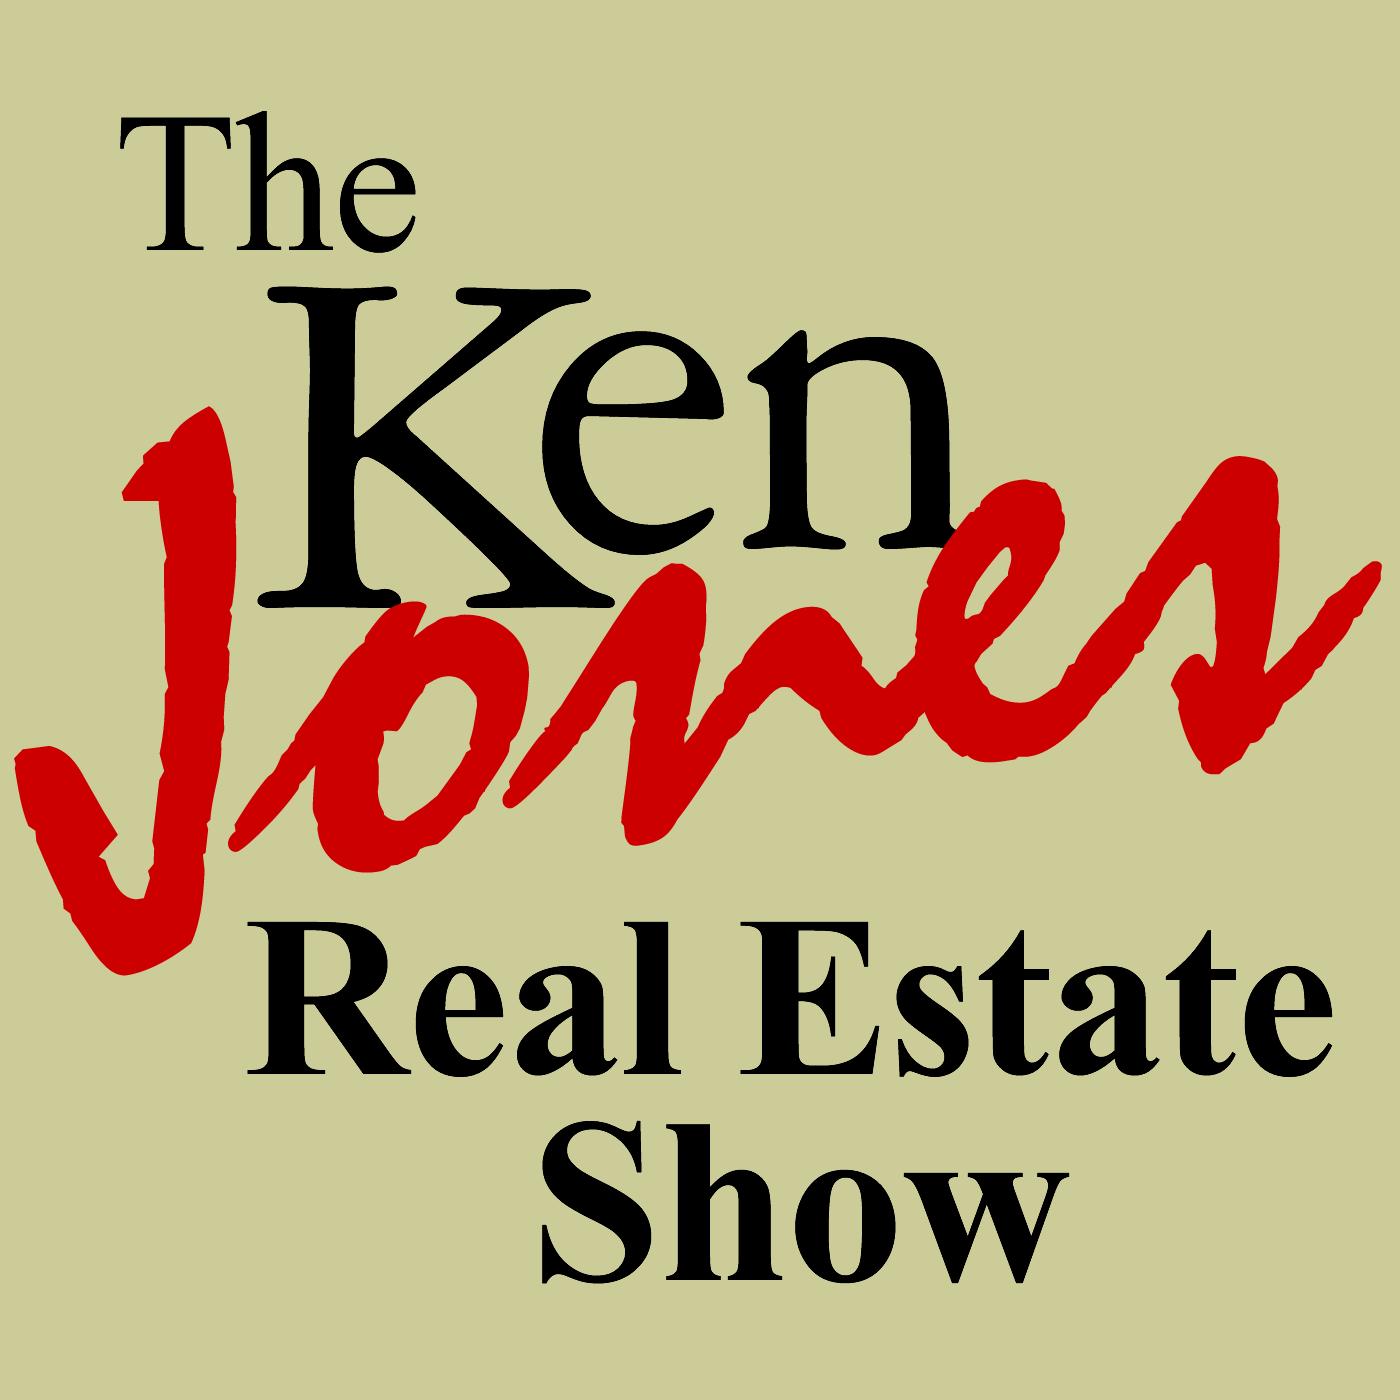 The Ken Jones Real Estate Show show art